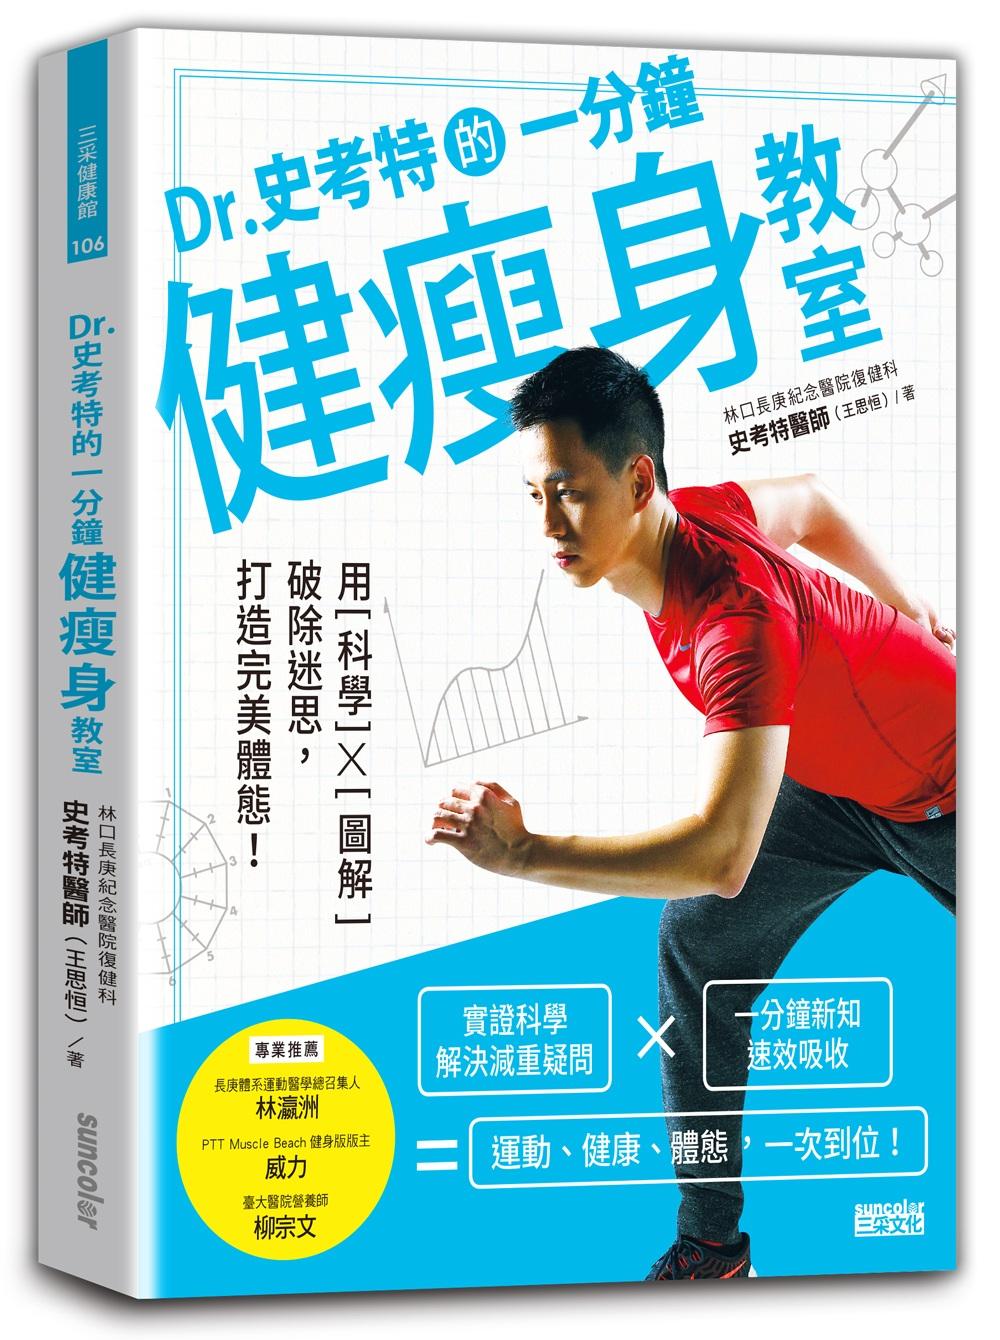 Dr.史考特的一分鐘健瘦身教室:用科學x圖解破除迷思,打造完美體態!